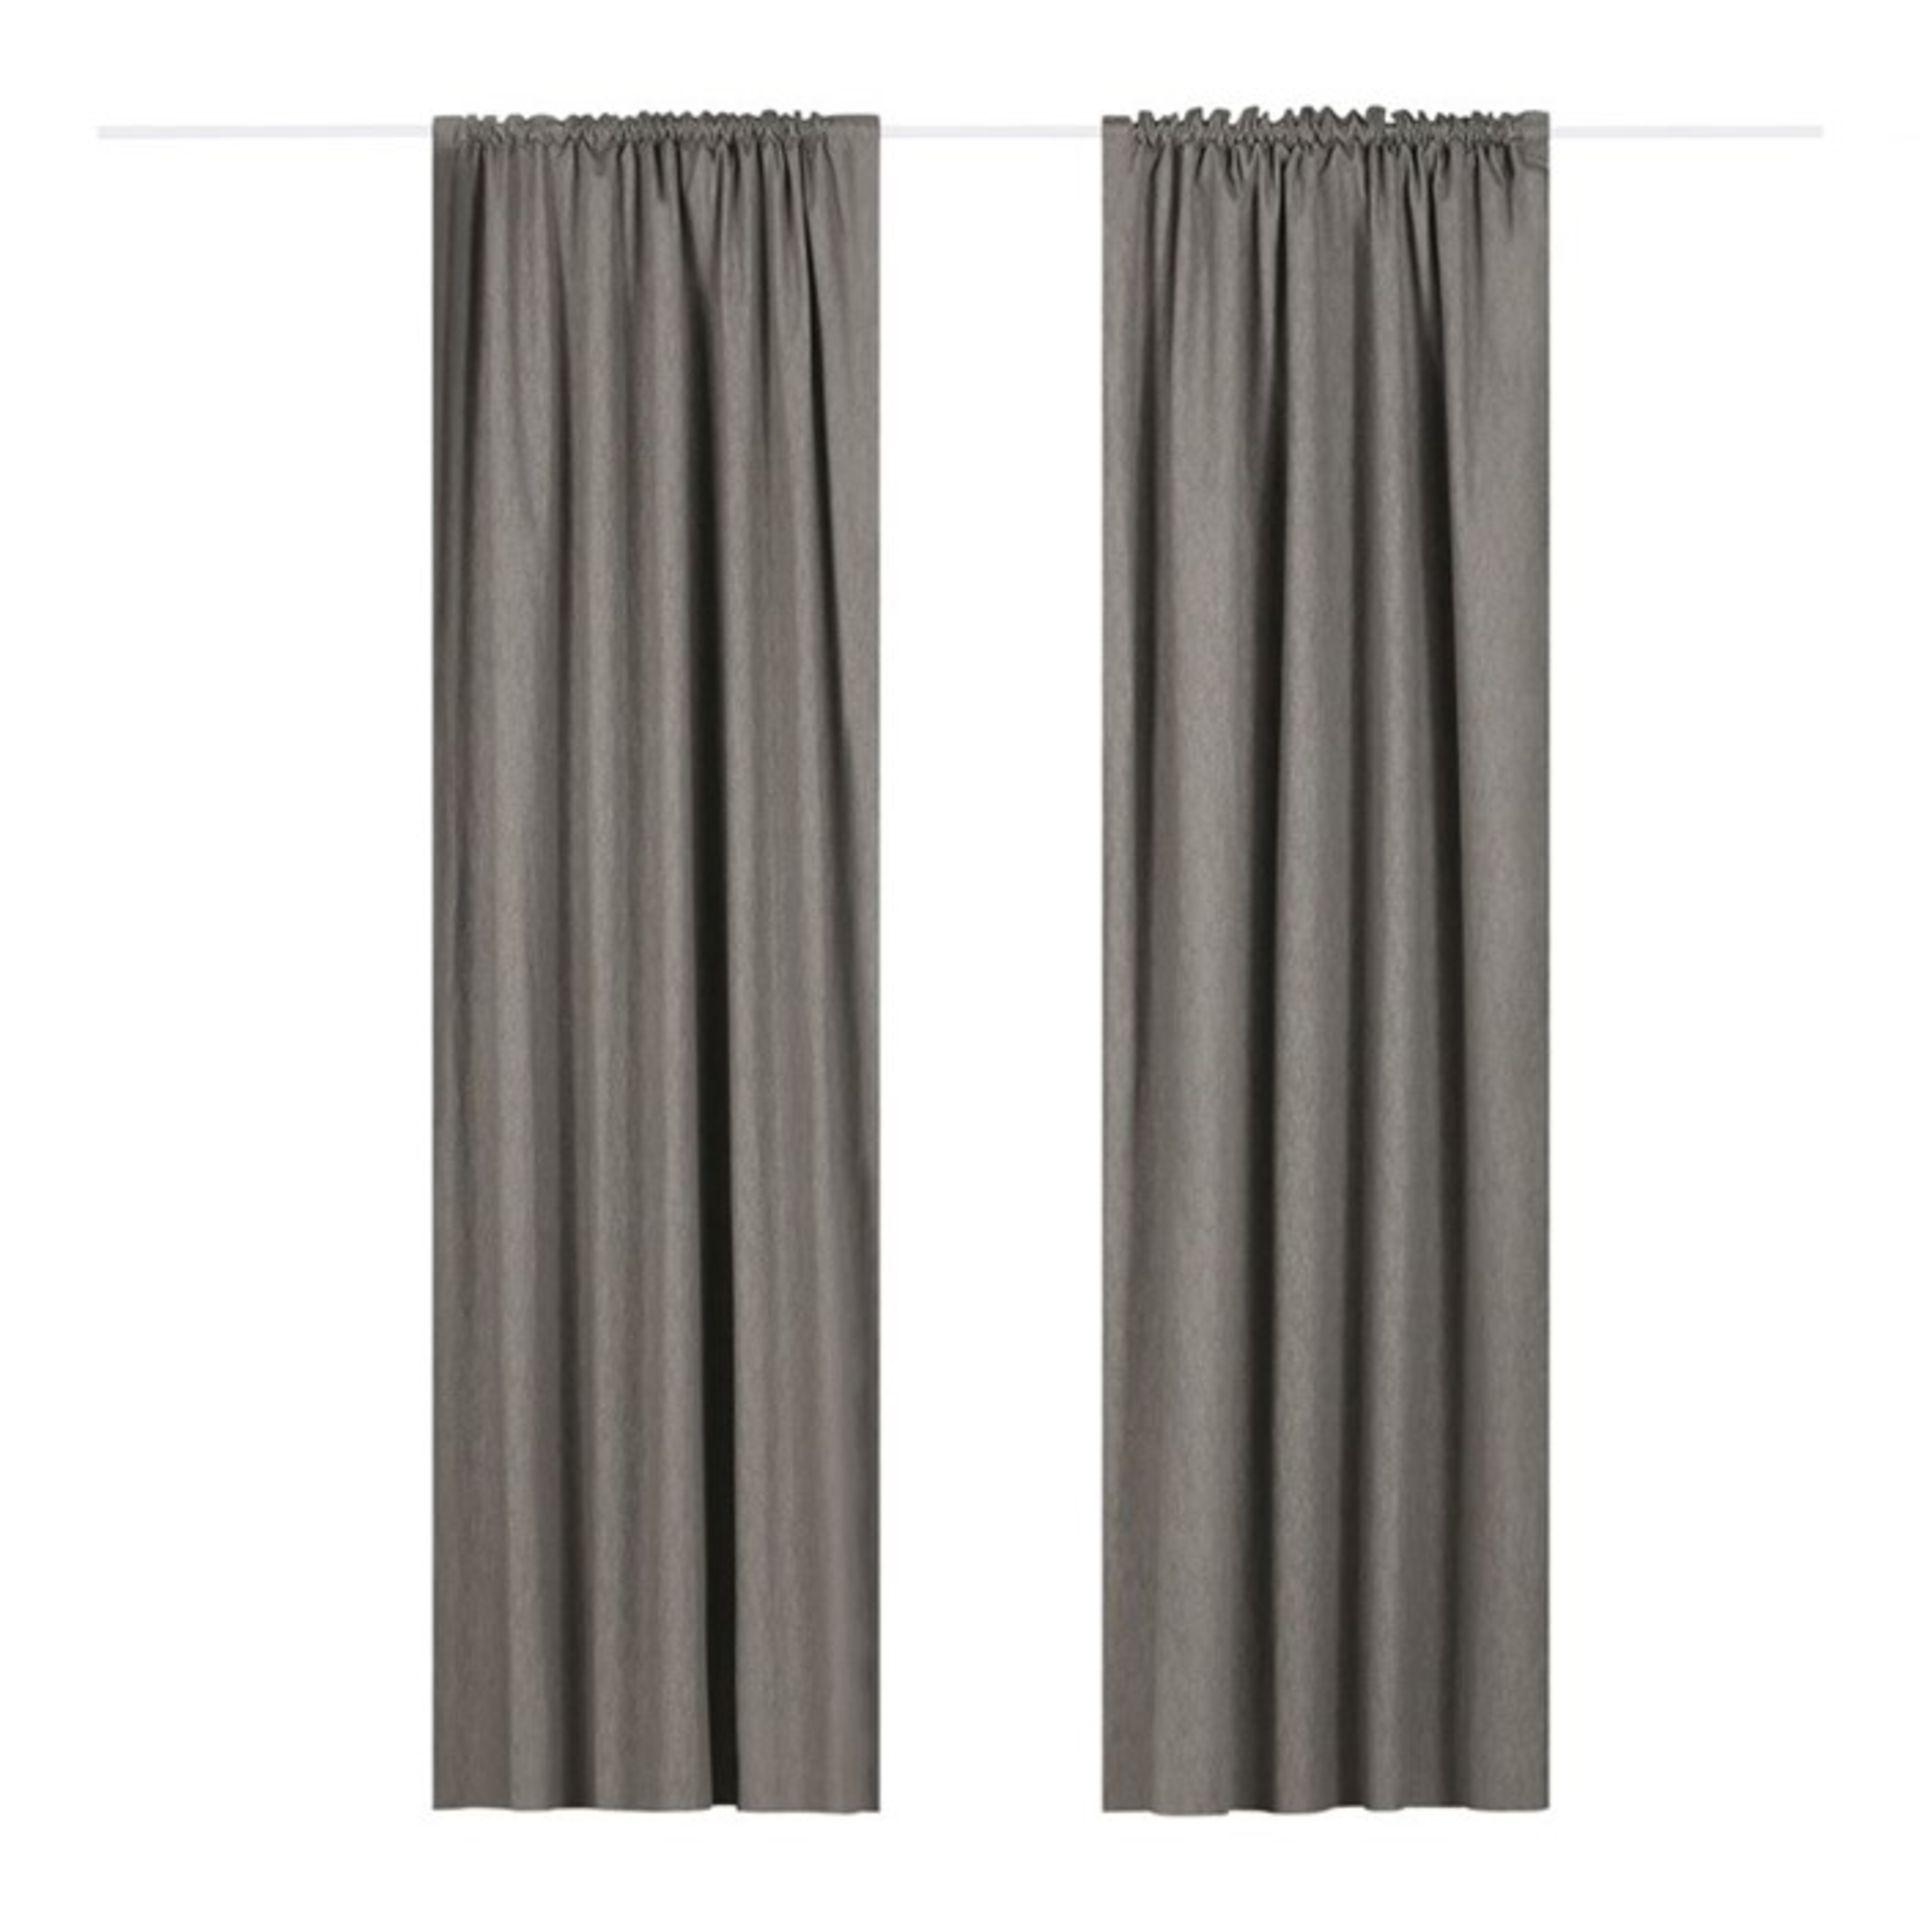 Marlow Home Co., Coleraine Pencil Pleat Blackout Thermal Curtains (117CM X 183CM / OCHRE) - RRP £